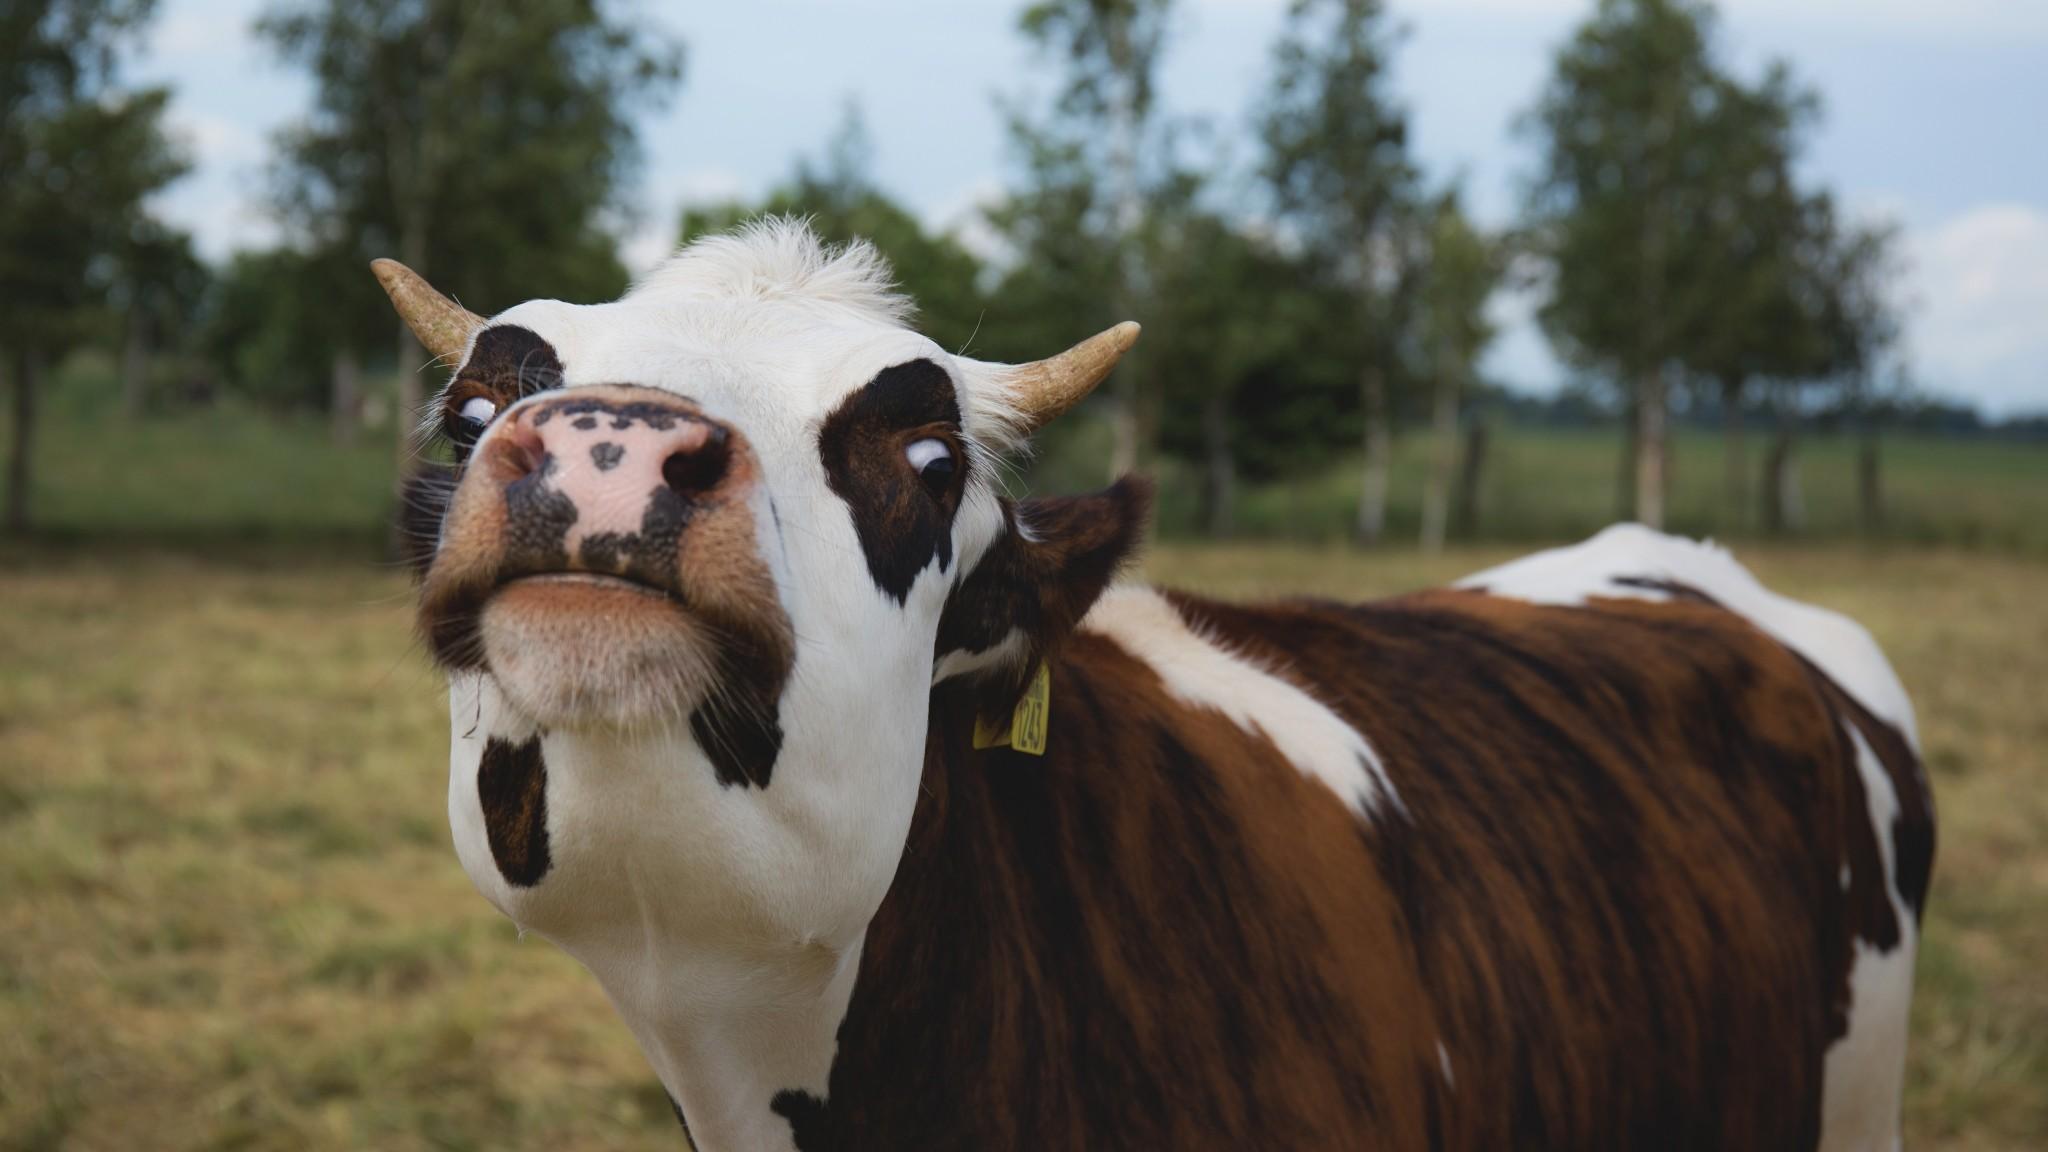 Cow Images Stock Photos amp Vectors  Shutterstock